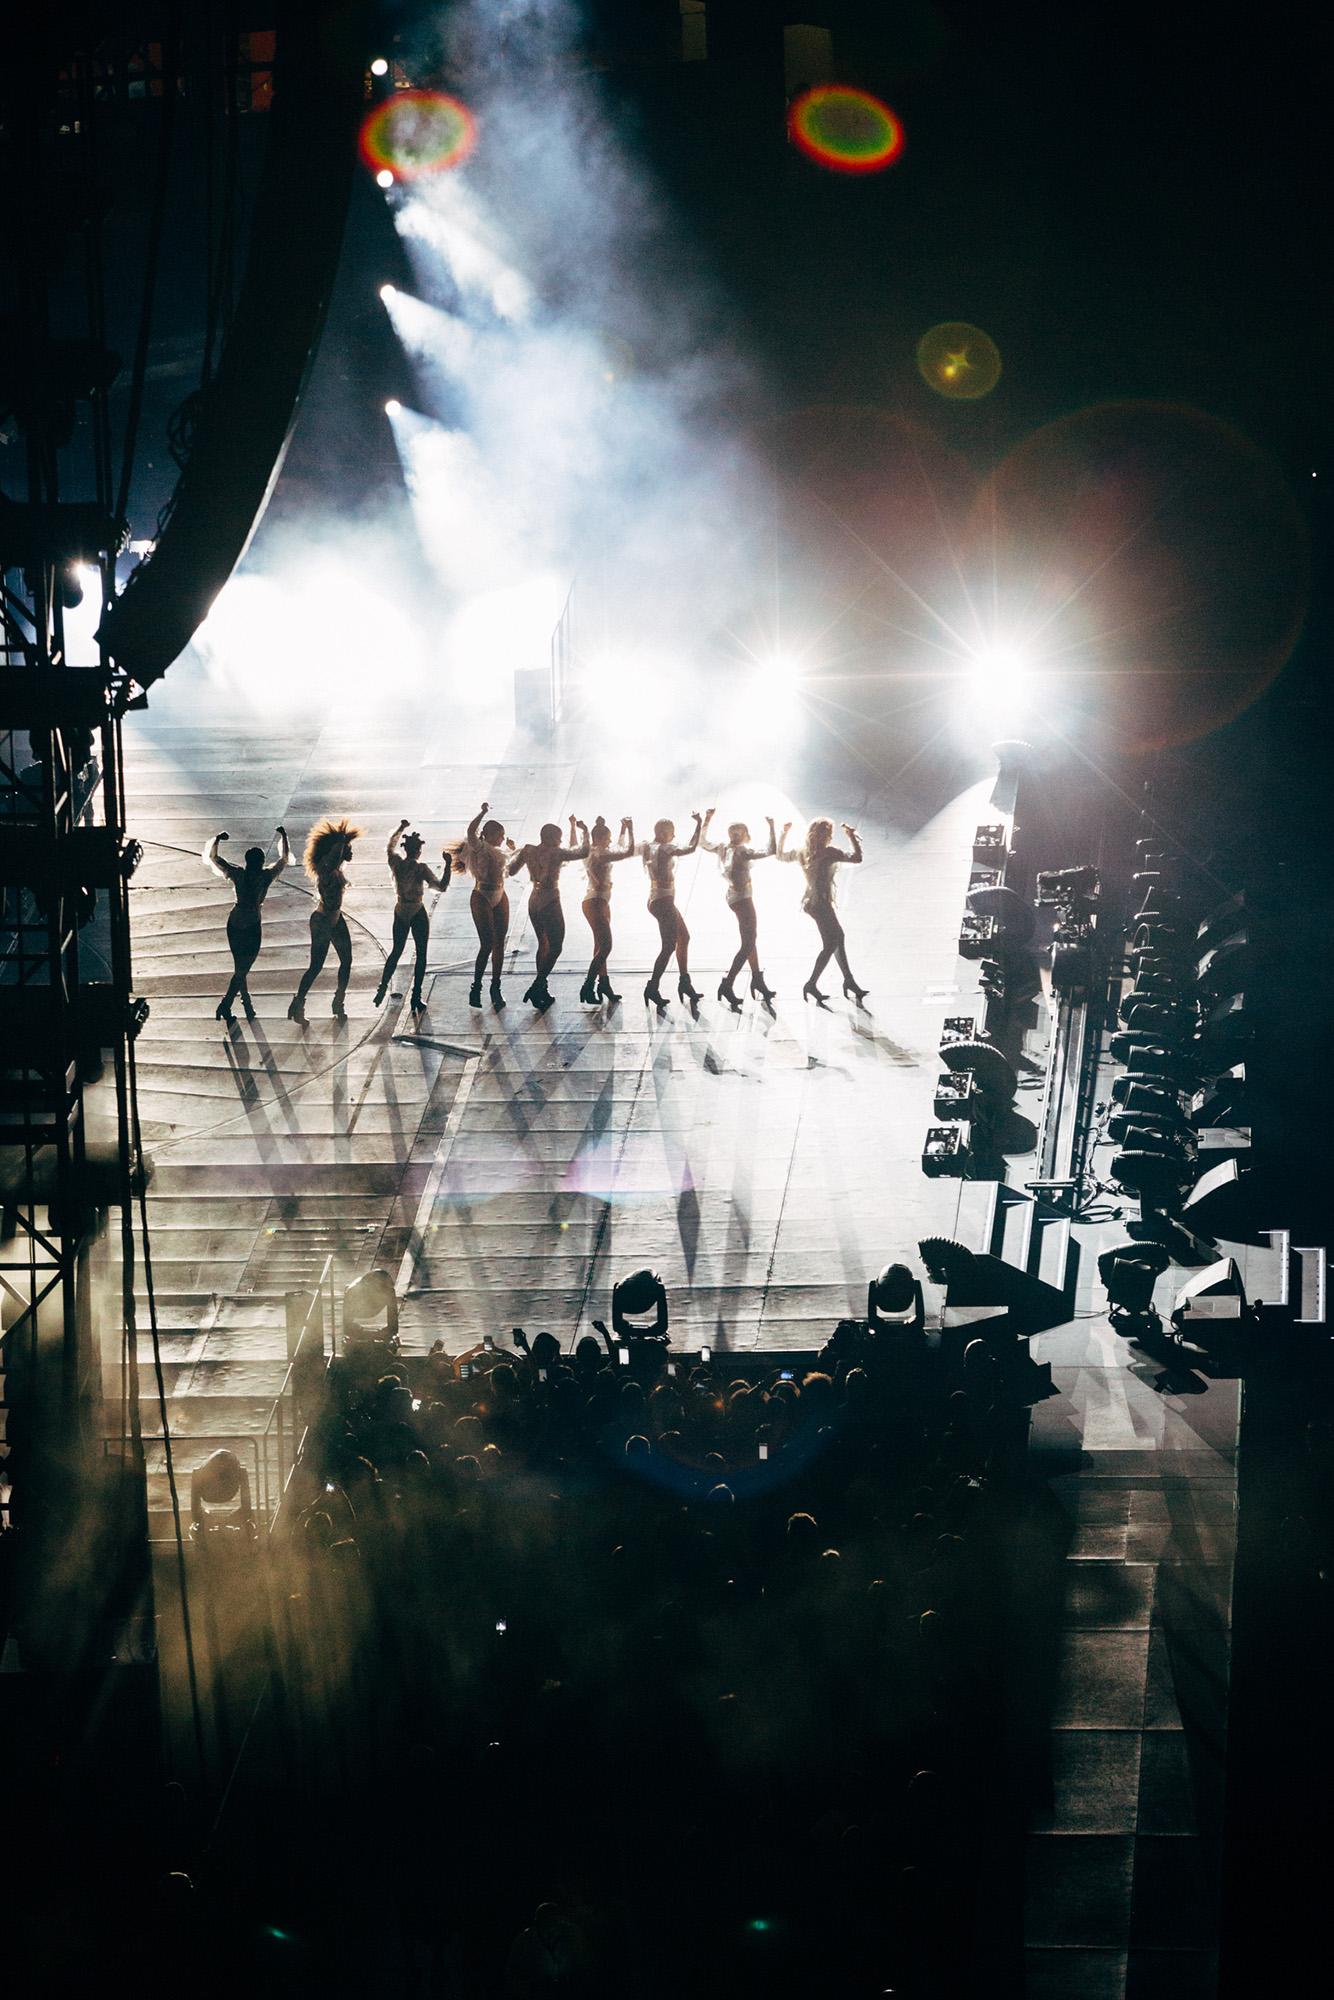 Dancers onstage at Beyoncé's Formation World Tour 2016.